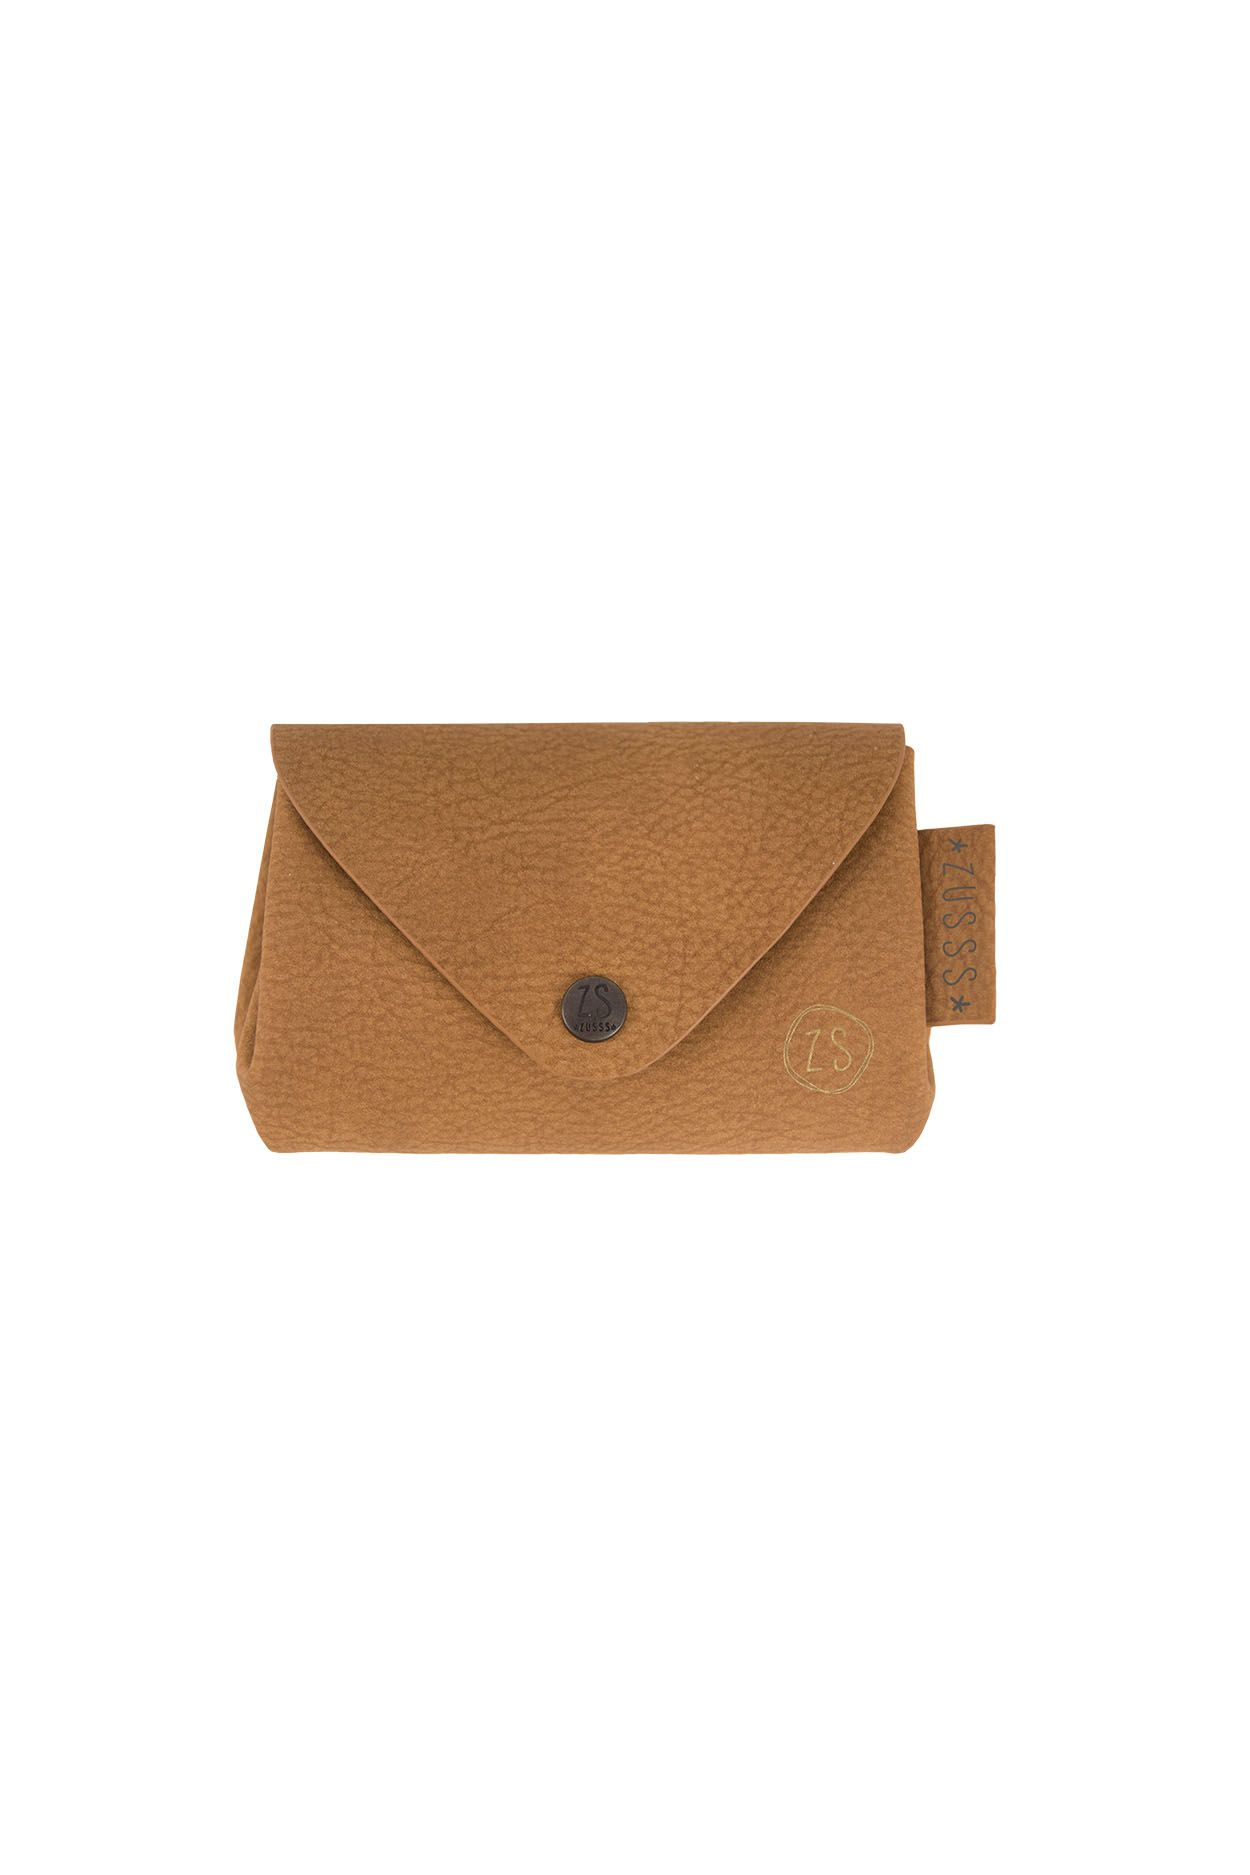 b93384af164 ZUSSS.NL - Lief beursje - Handige portemonnees shop je hier!